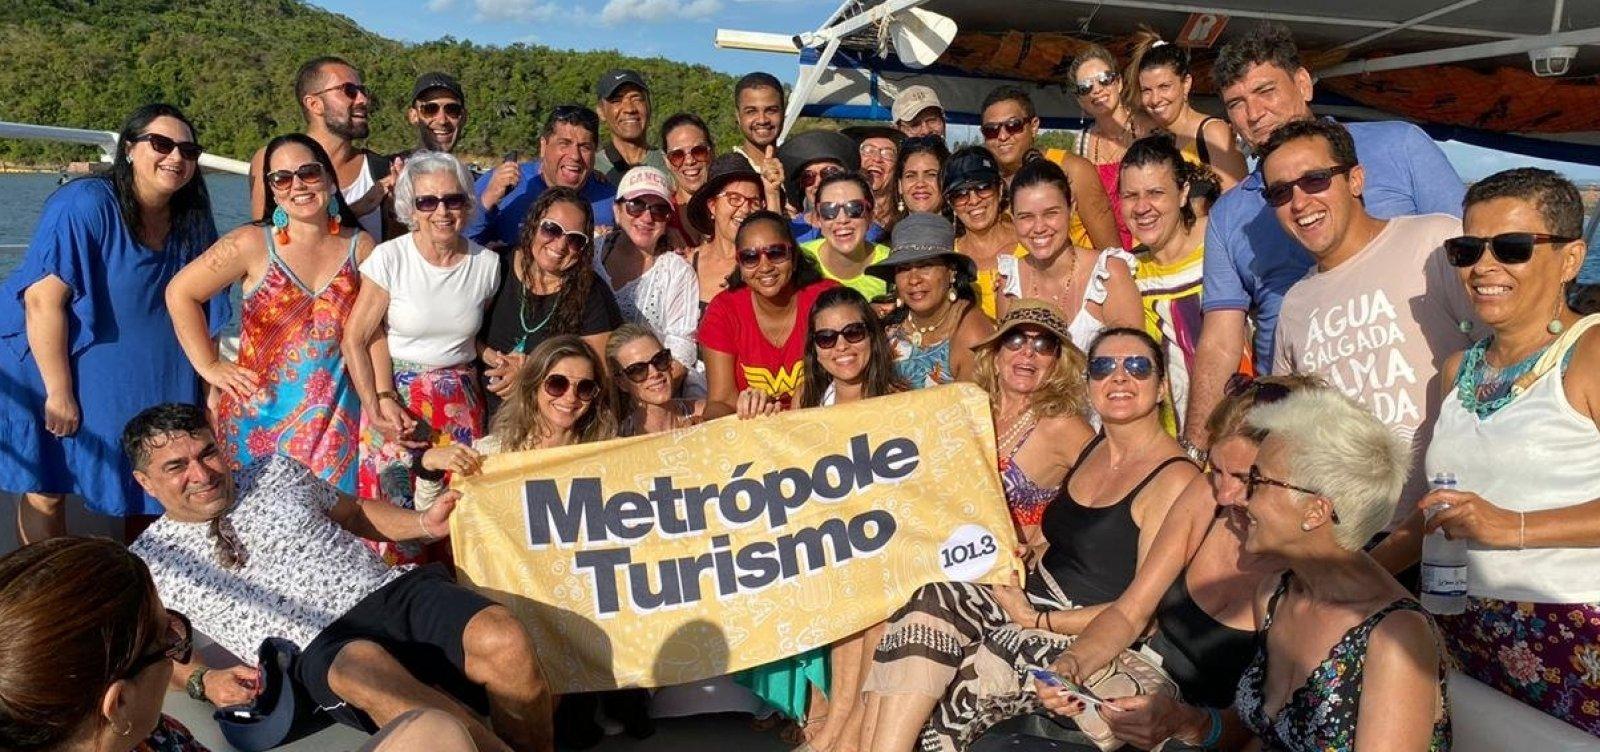 Metrópole Turismo leva 50 ouvintes para passeio de catamarã até Ilha dos Frades